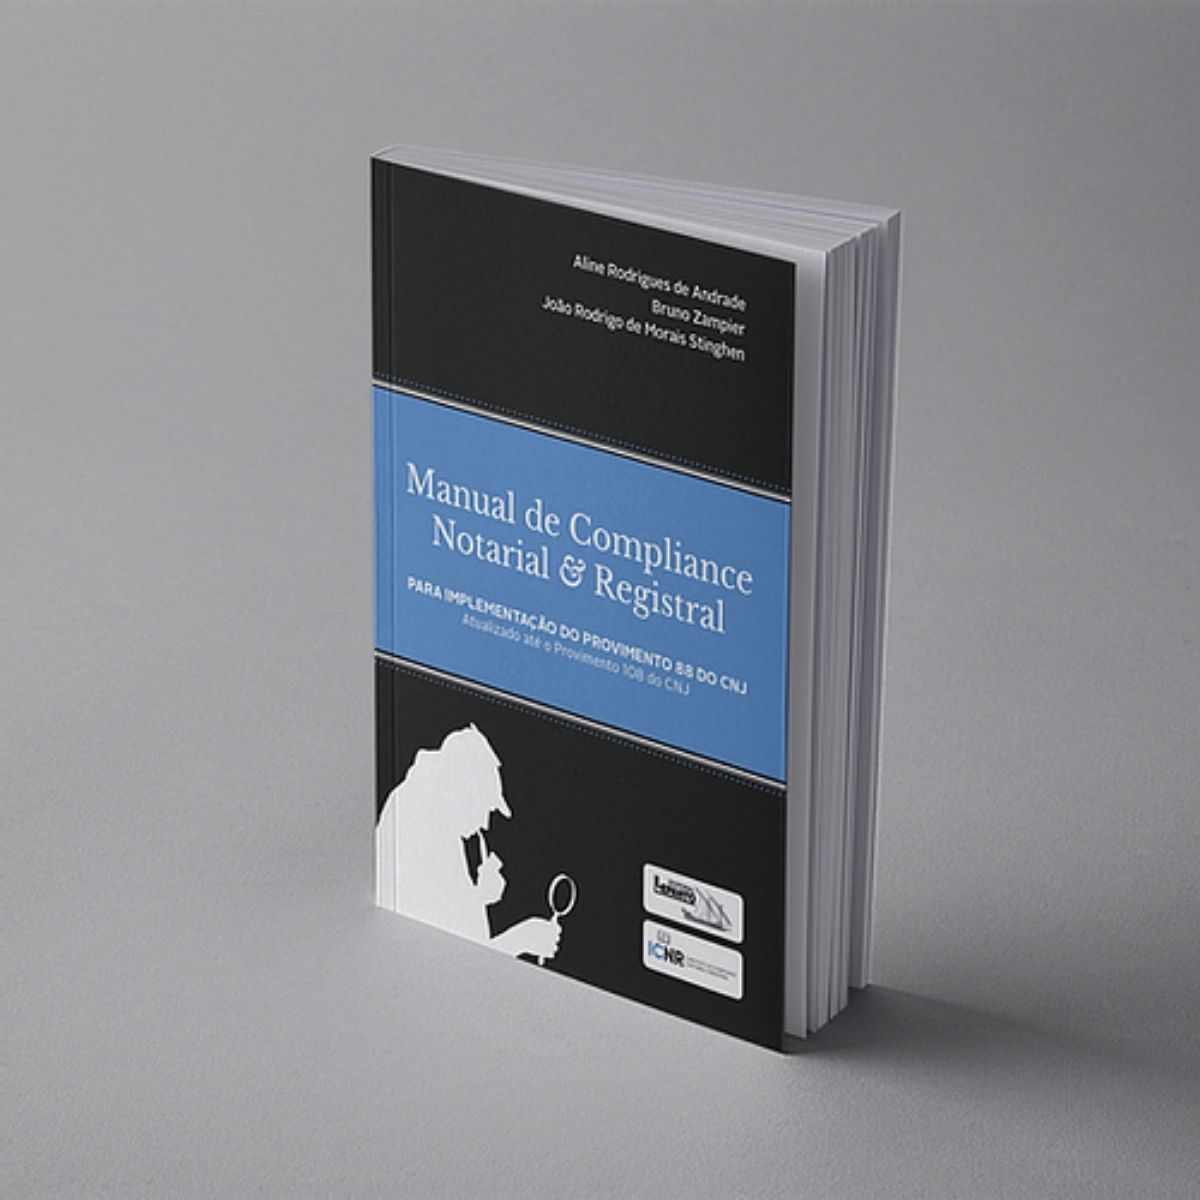 Manual de Compliance - Notarial e Registral